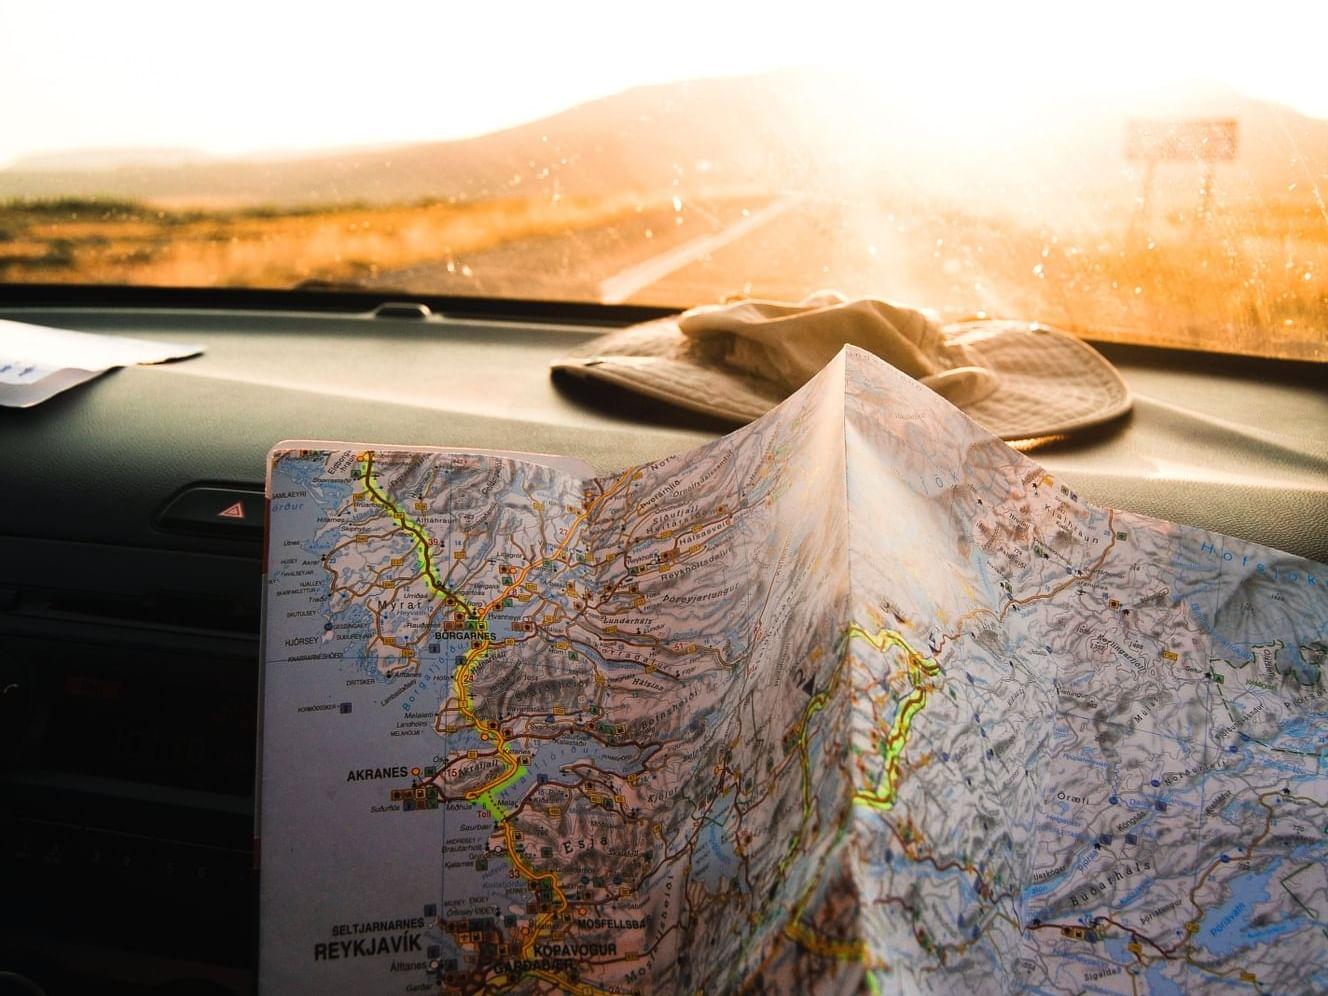 A map on top of a dashboard of a car near Henn Na Hotel